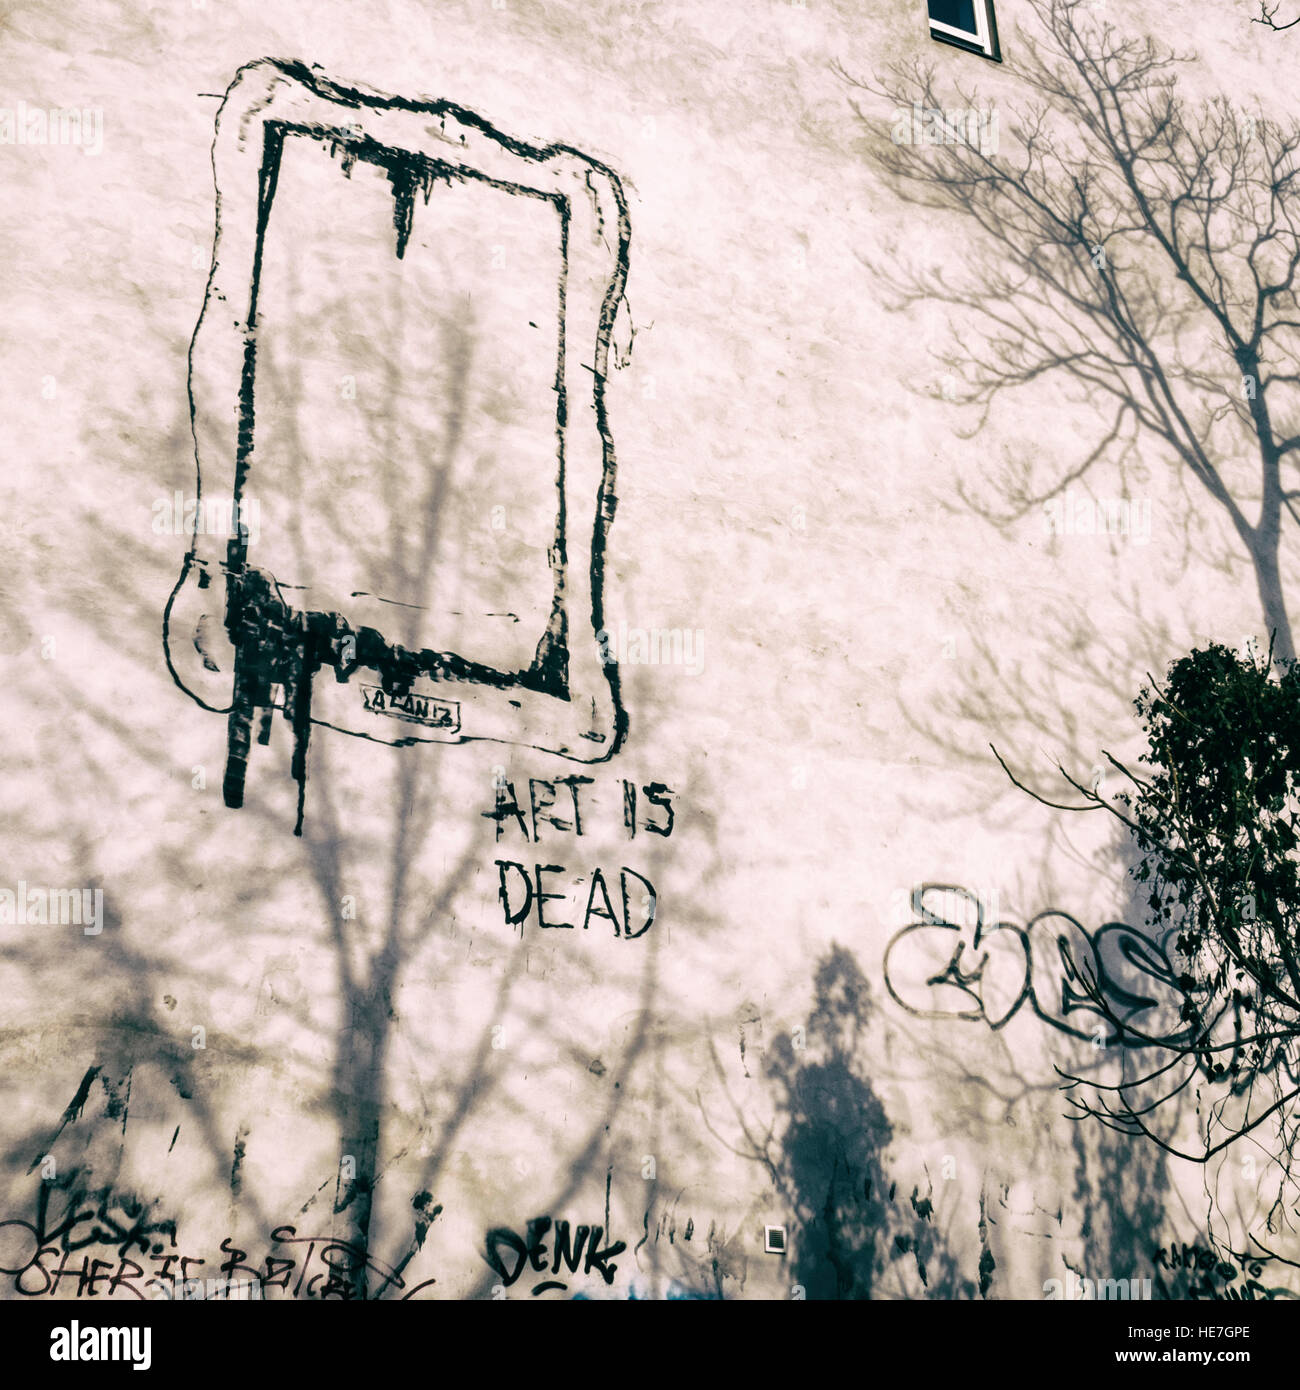 art-is-dead-drawing-of-empty-frame-and-leaking-paint-street-art-on-HE7GPE.jpg